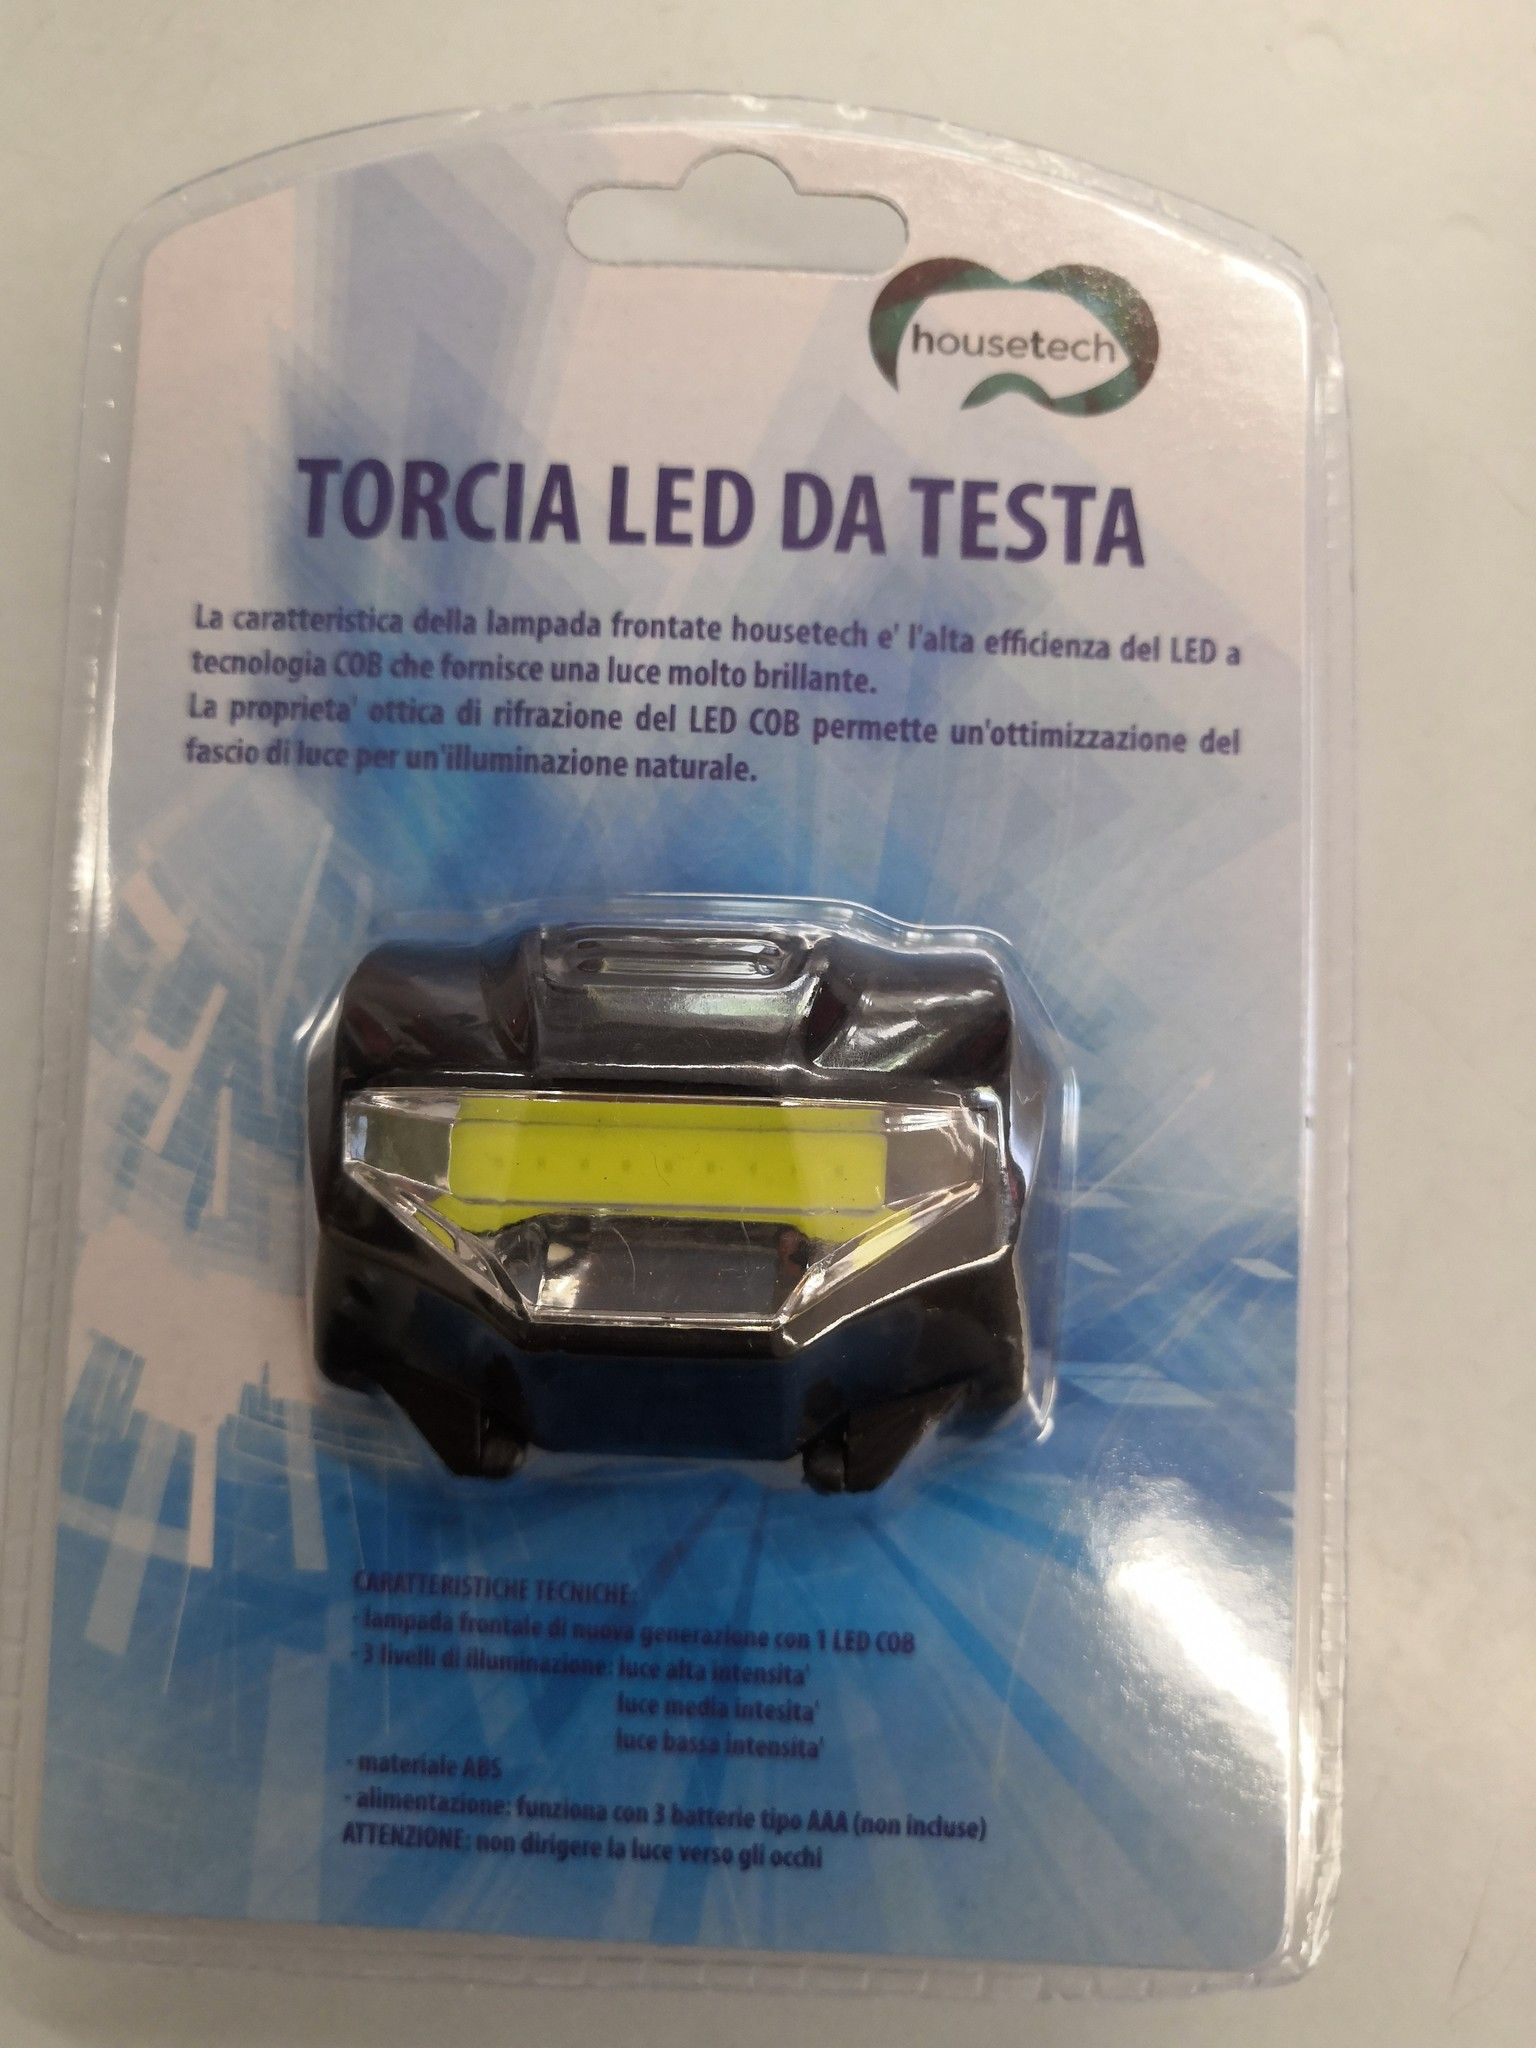 TORCIA LED DA TESTA